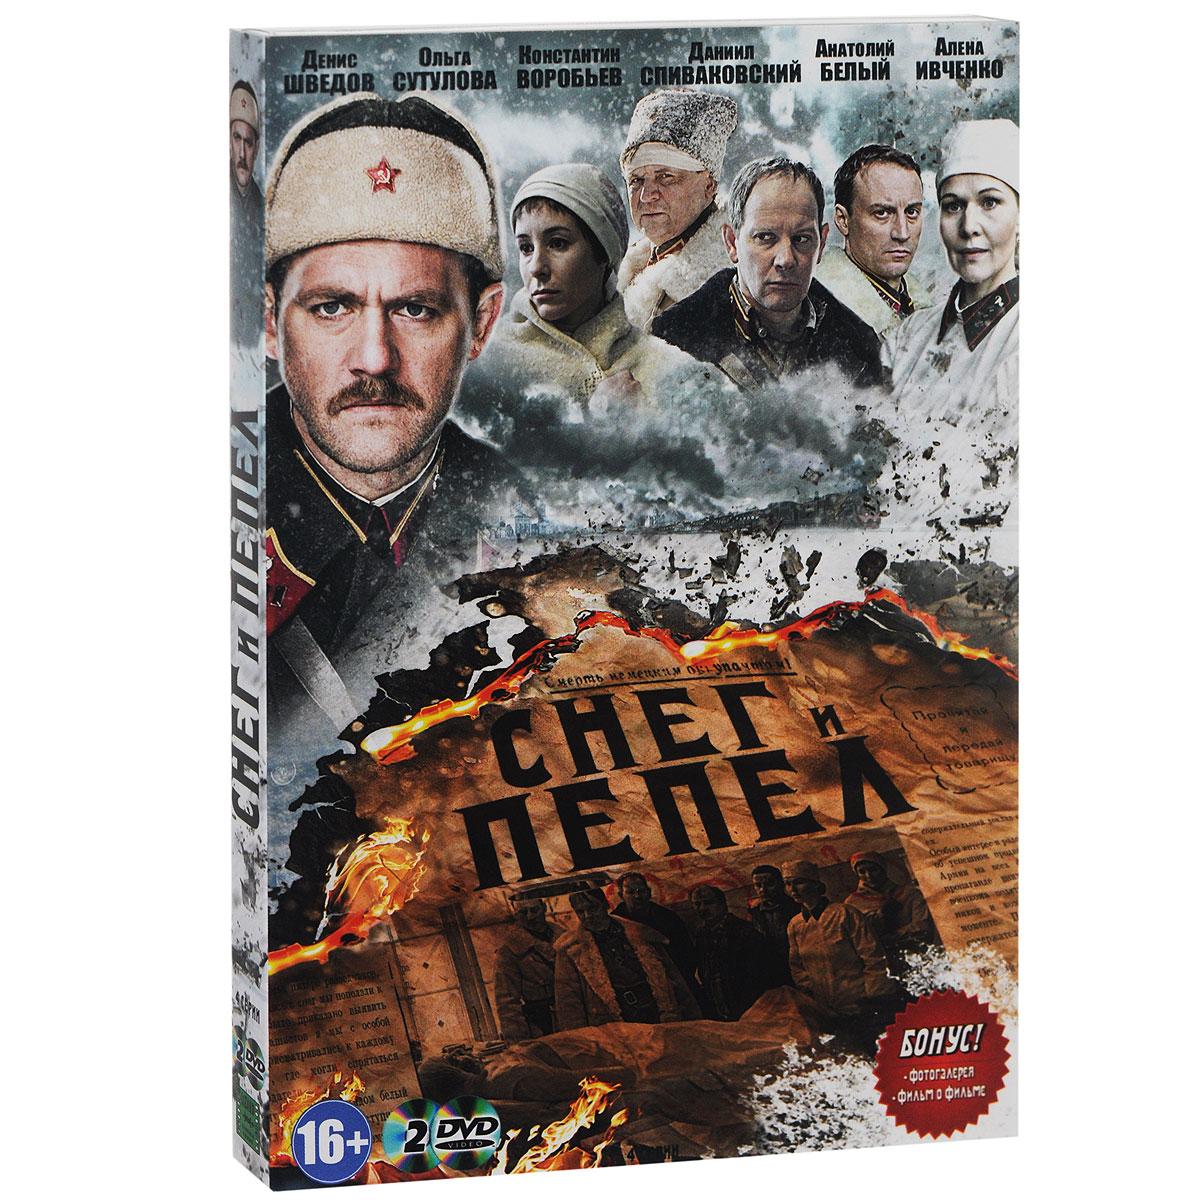 Снег и пепел (2 DVD)